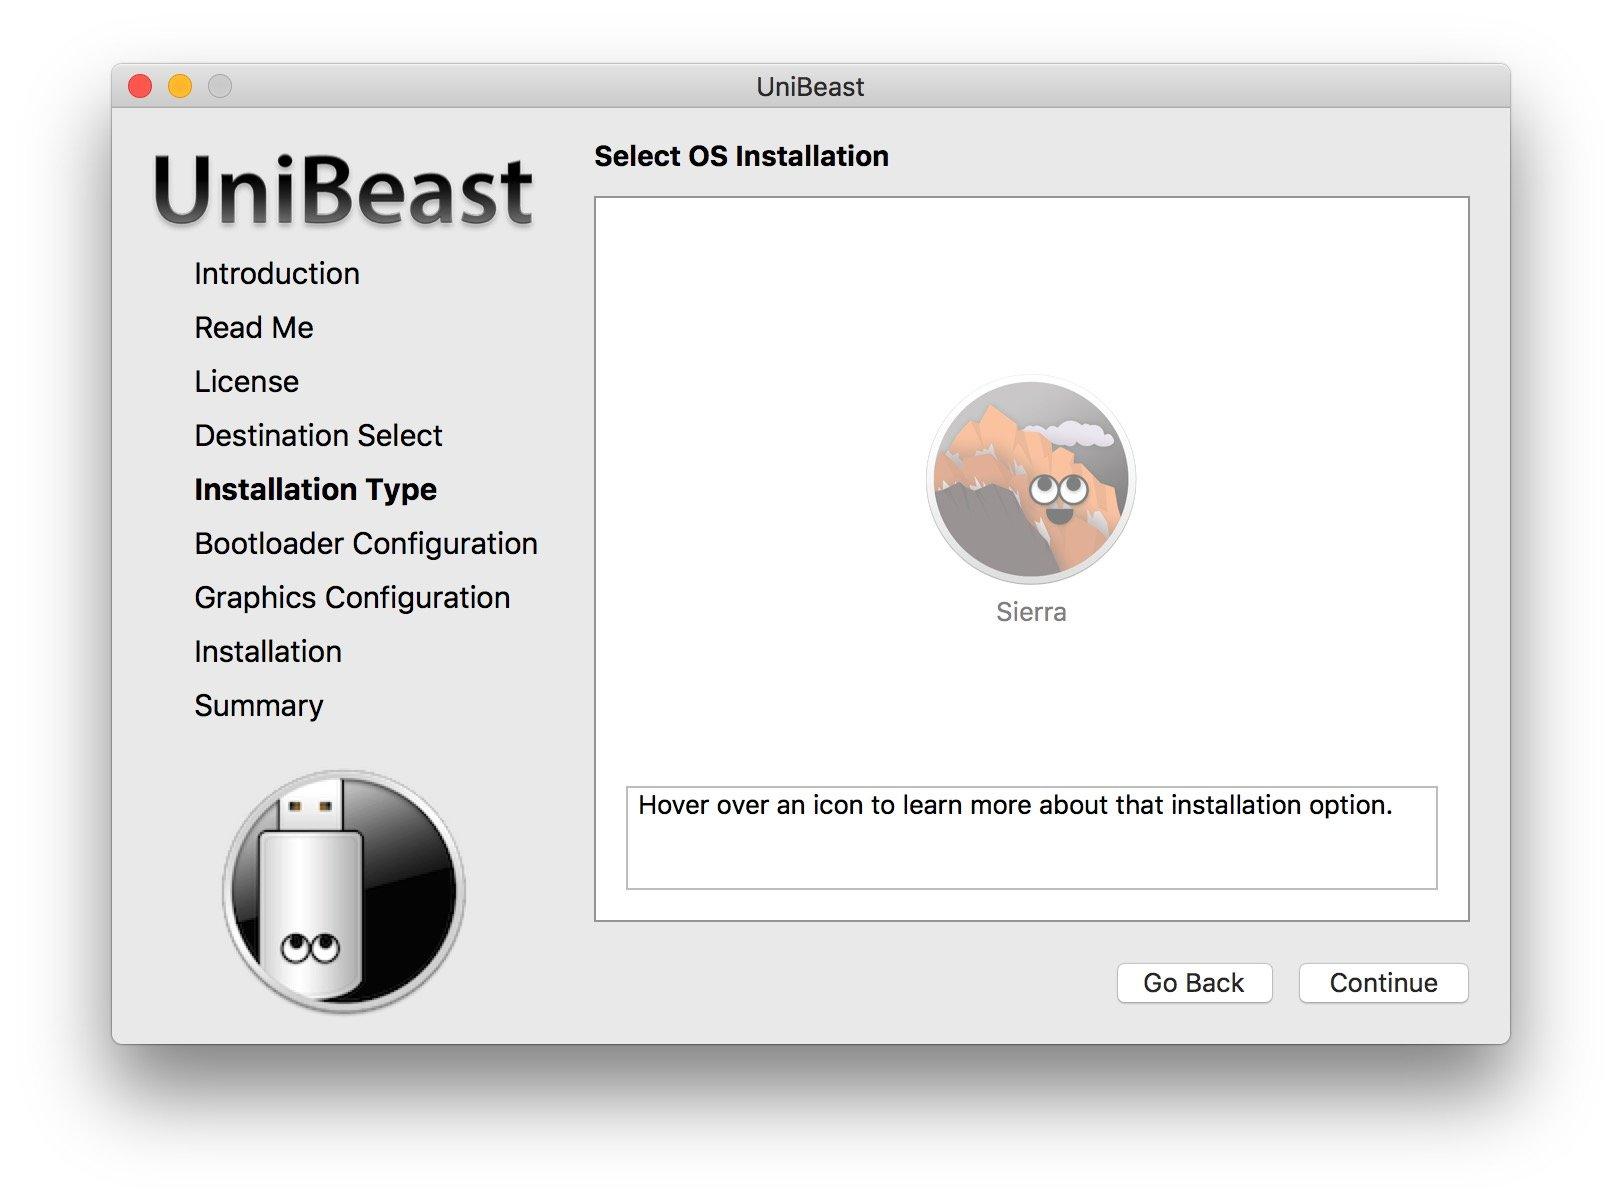 UniBeast Select OS